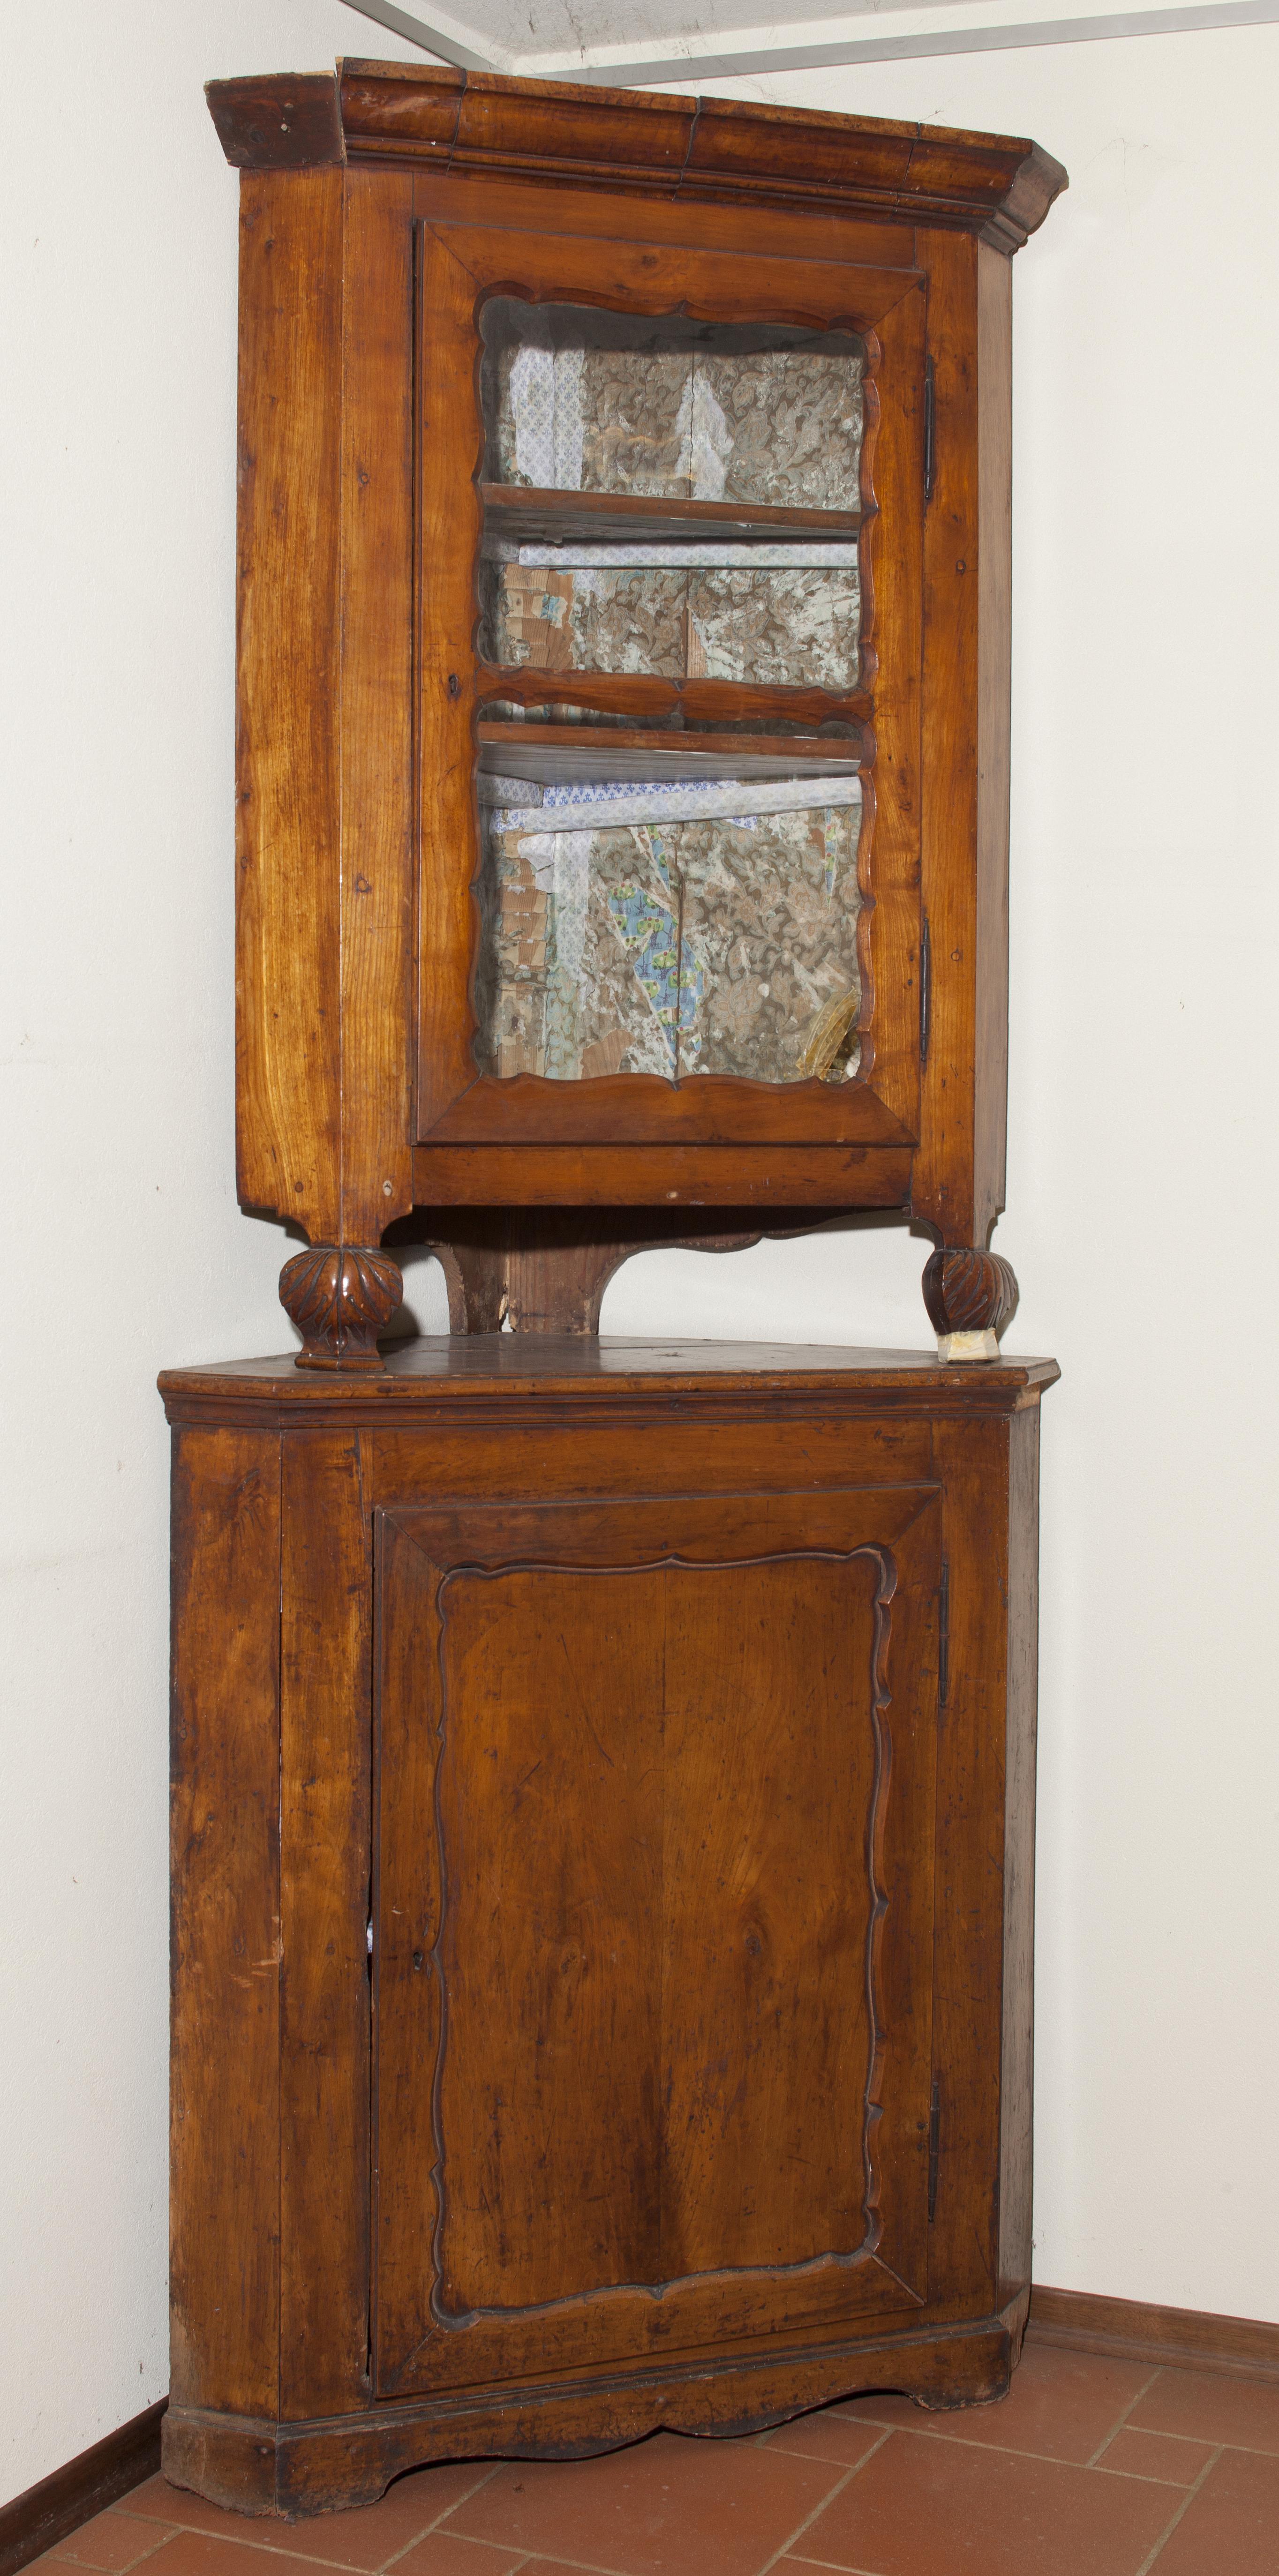 Angolari biedermeier antichita marchetti - Marchetti mobili d arte ...